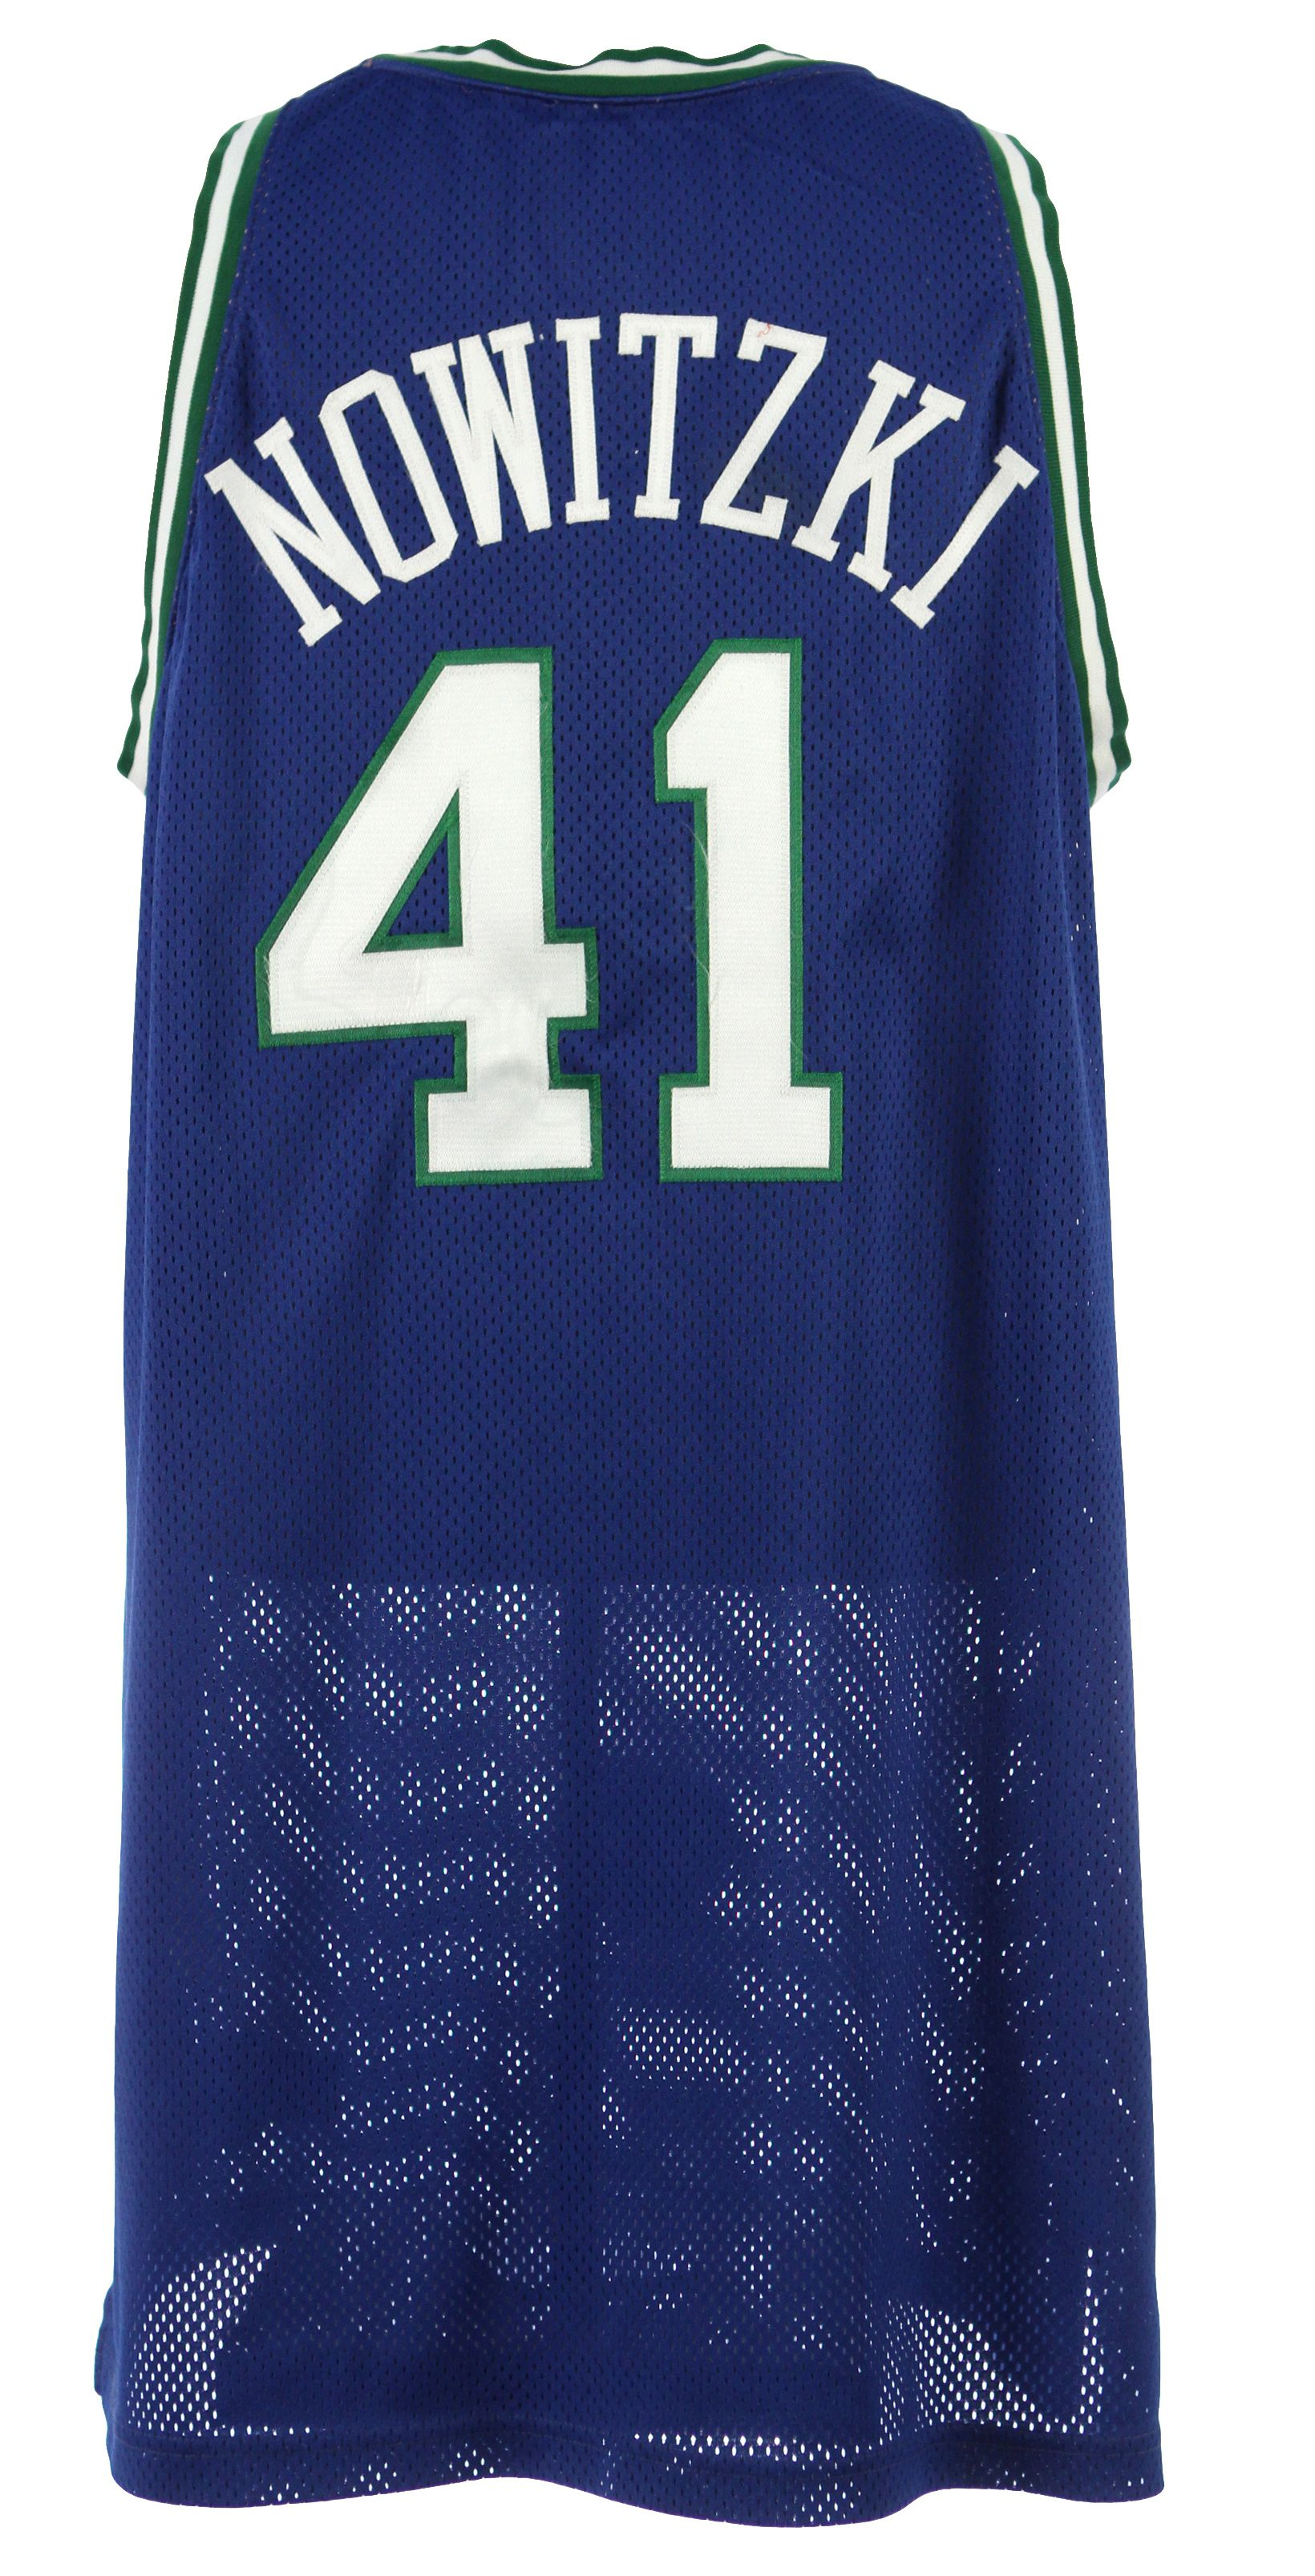 get cheap 87ce1 b4f6c Lot Detail - 1999-2000 Dirk Nowitzki Dallas Mavericks Game ...